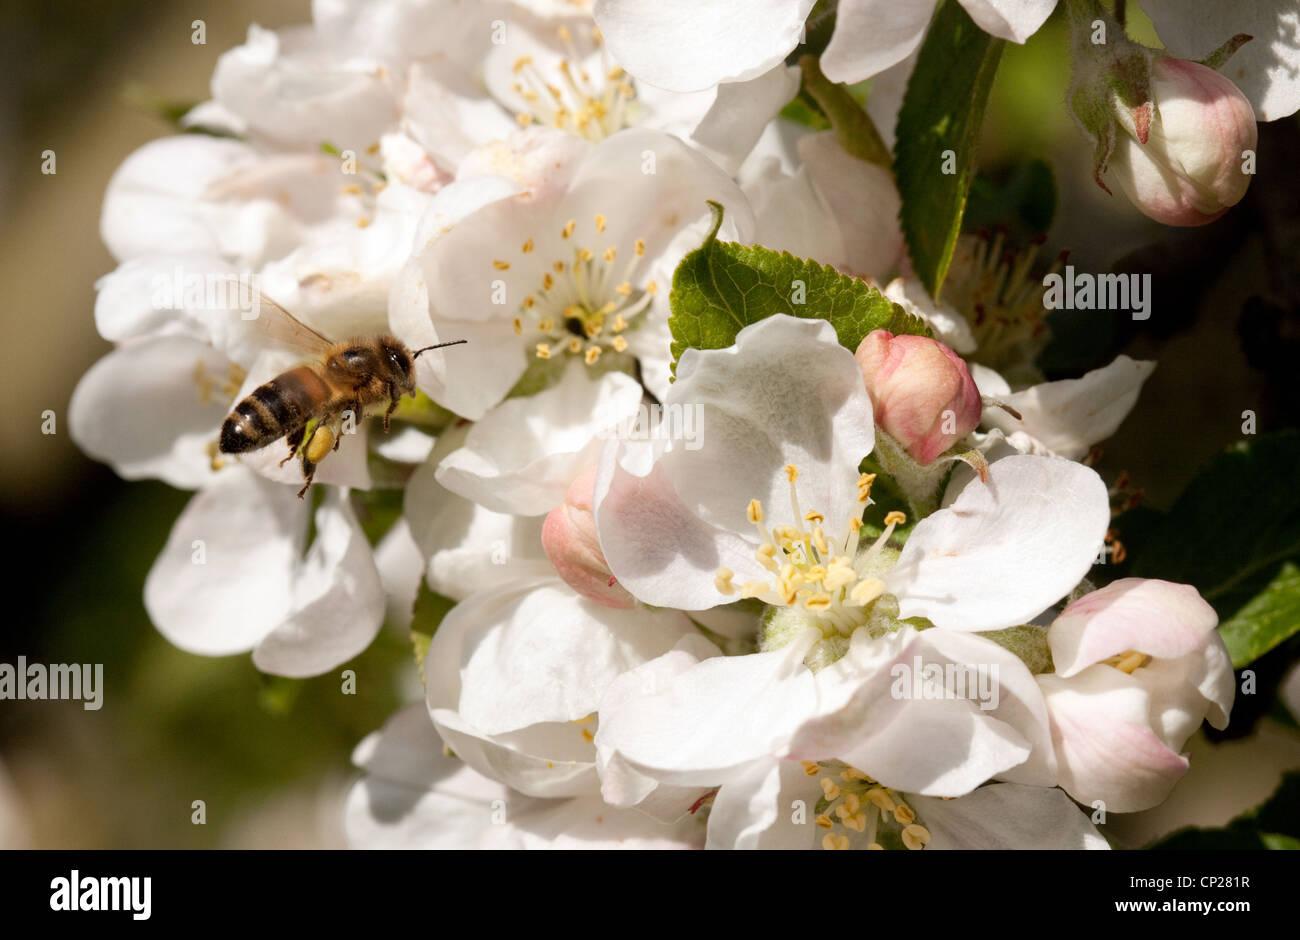 Honey Bee (Apis Mellifera) on apple blossom, UK - Stock Image